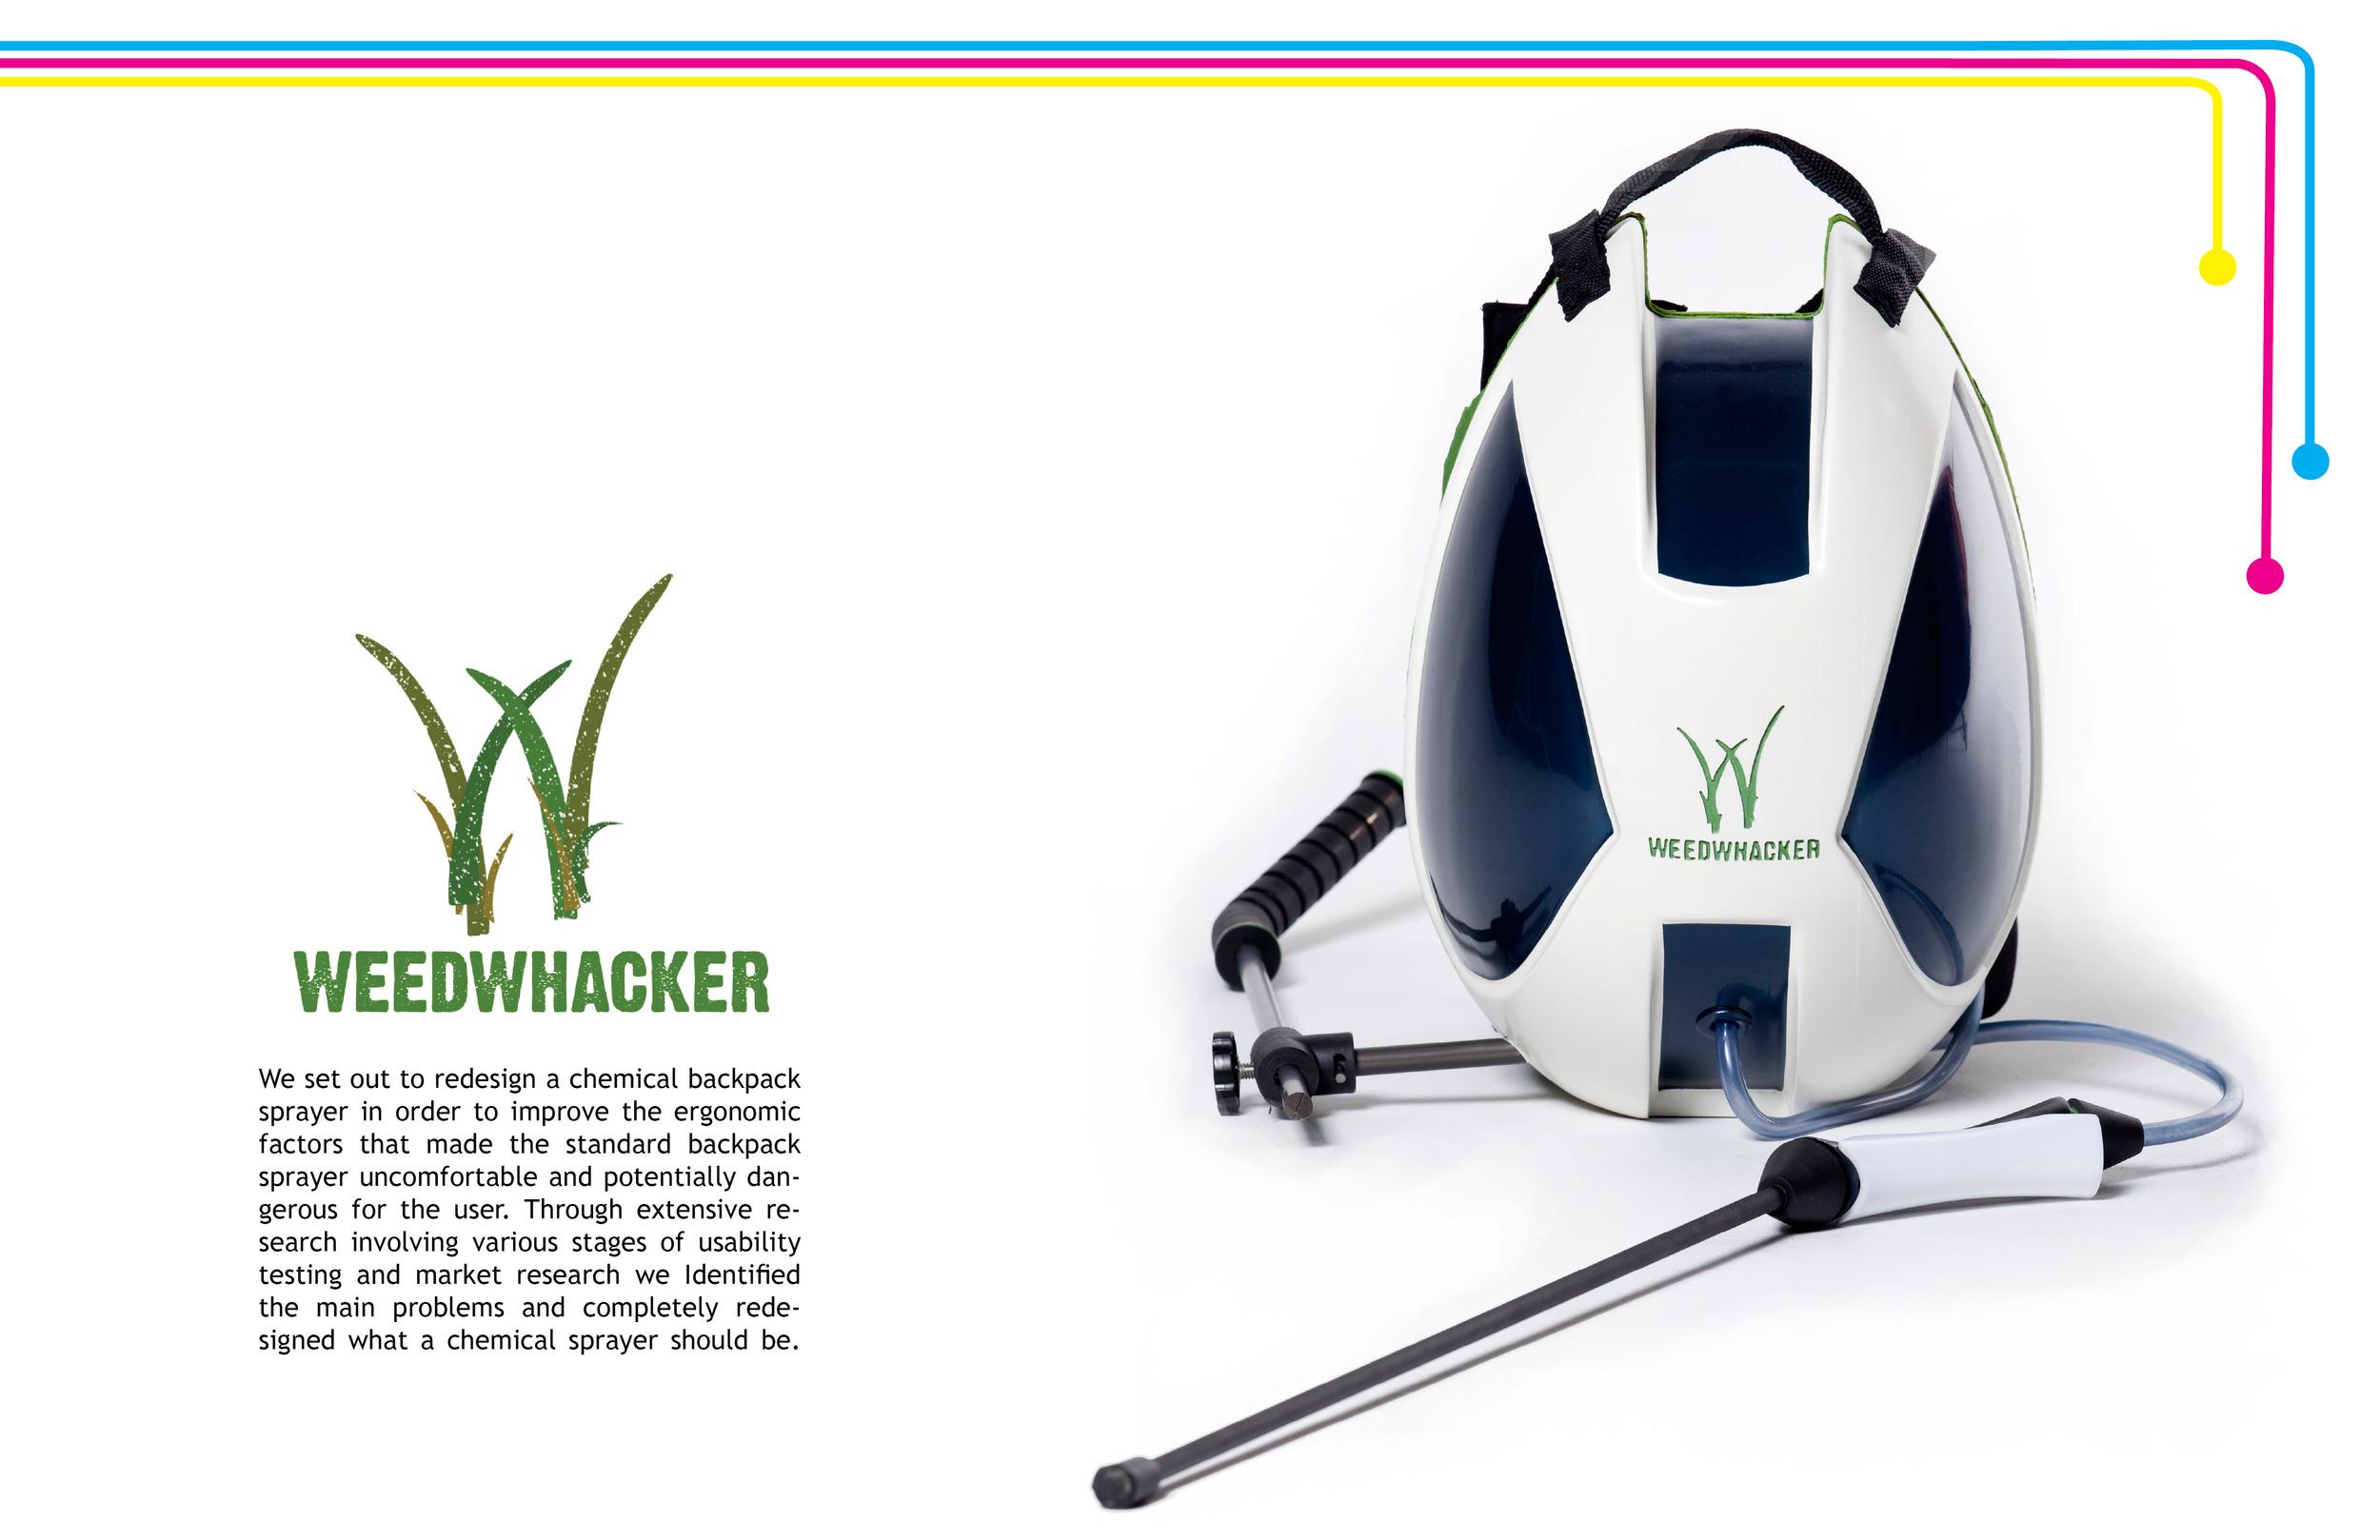 Weedwhaker Chemical Sprayer by Sebastian Campos Moller